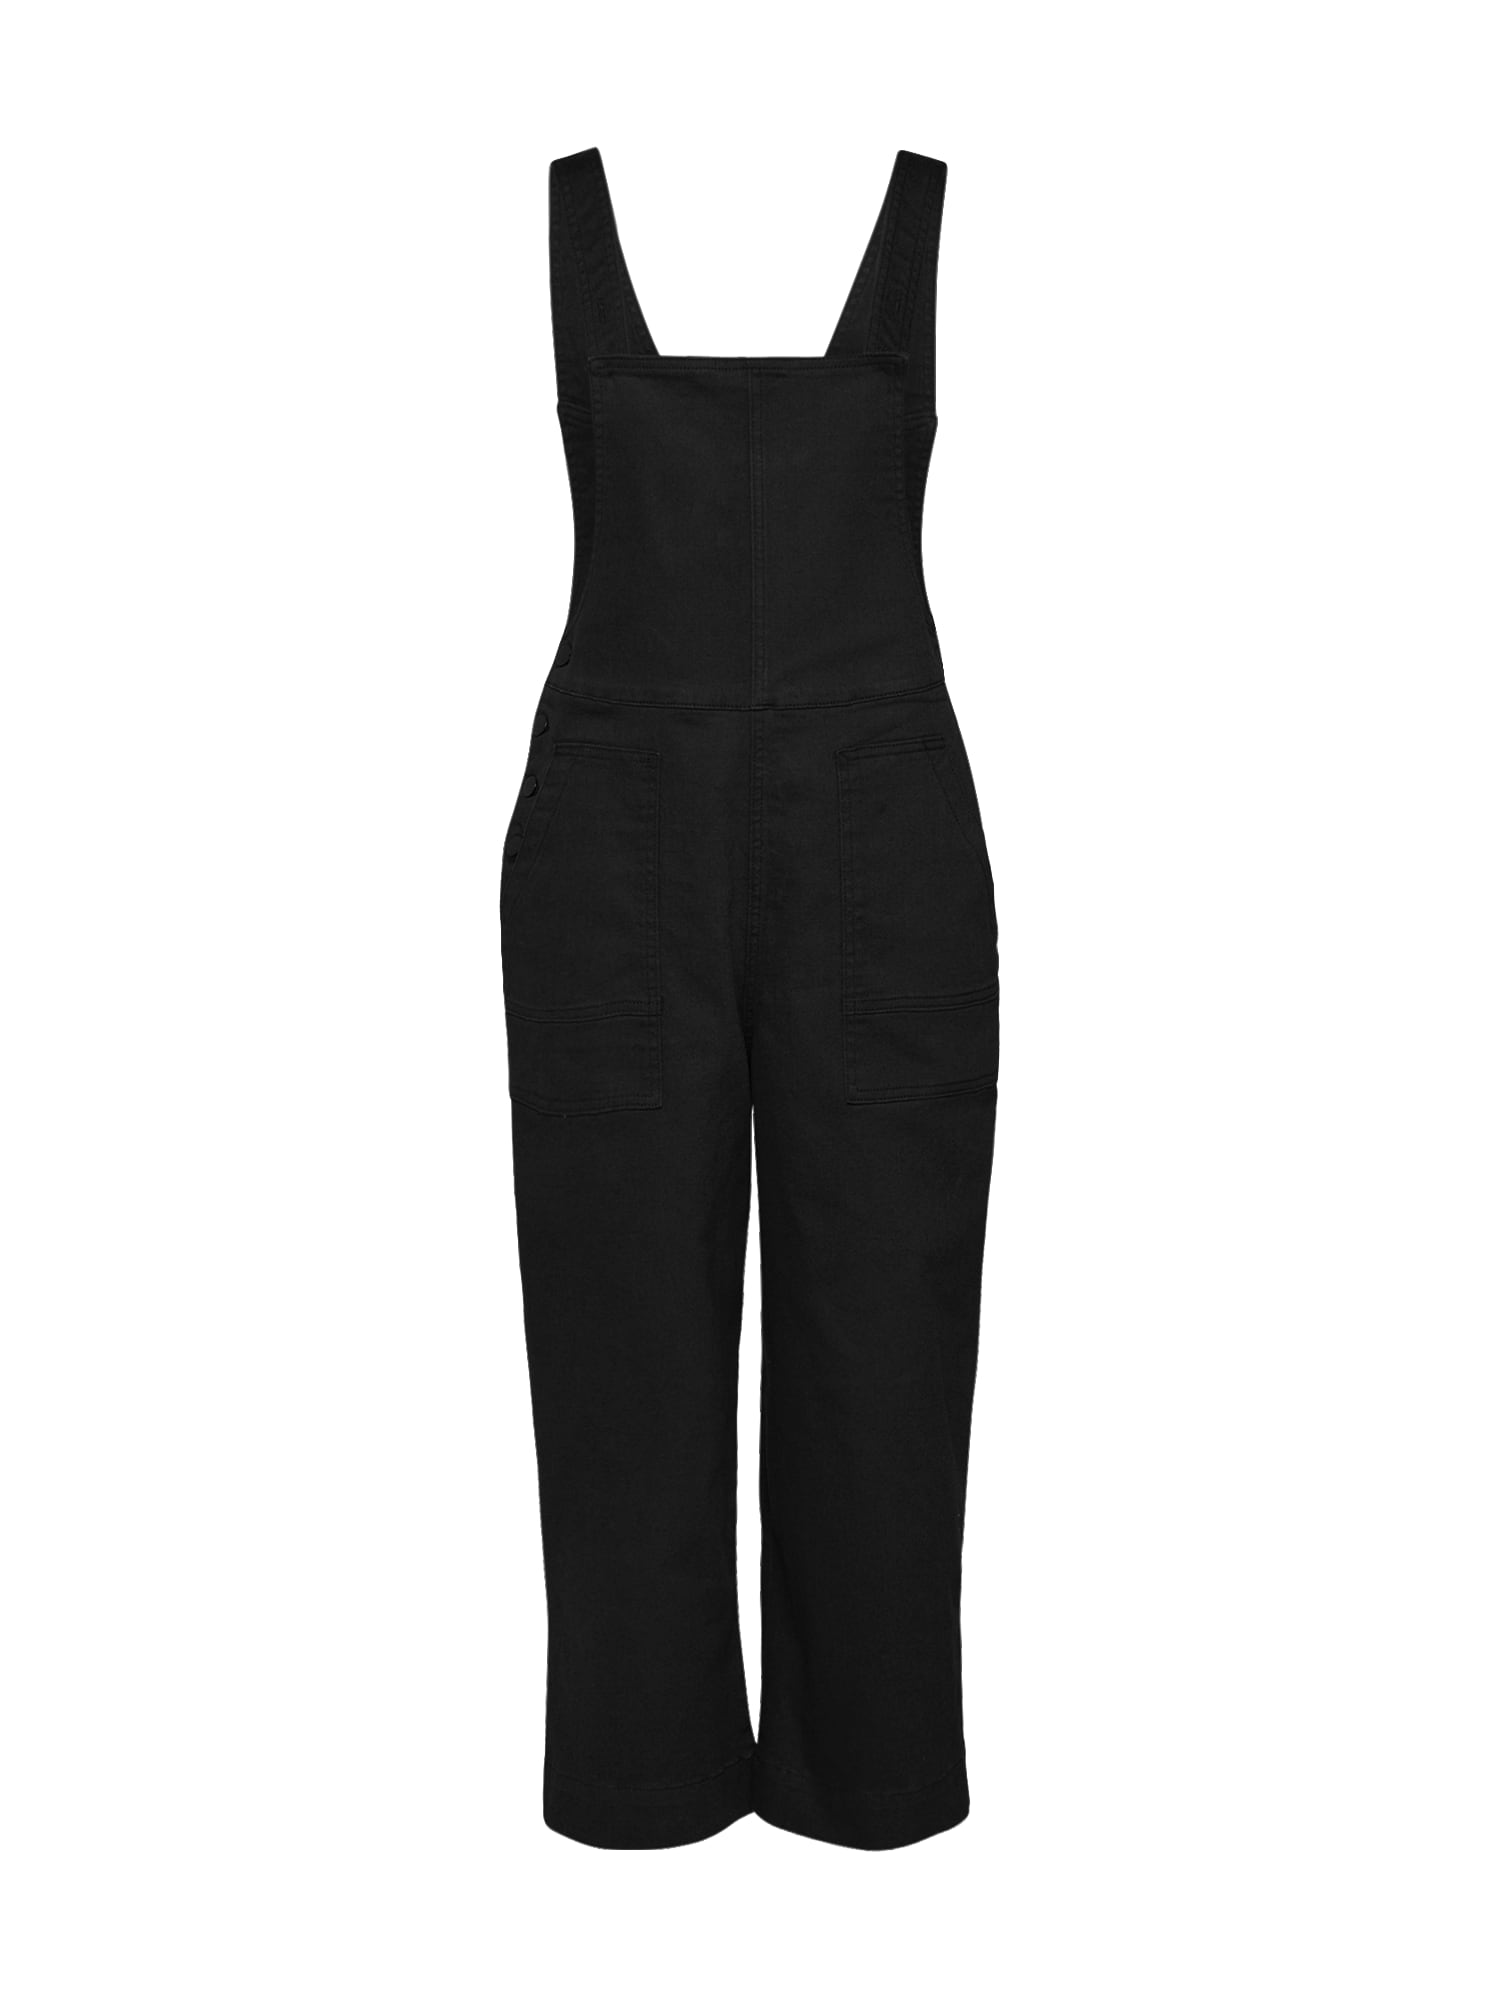 Laclové kalhoty Veronika černá EDITED